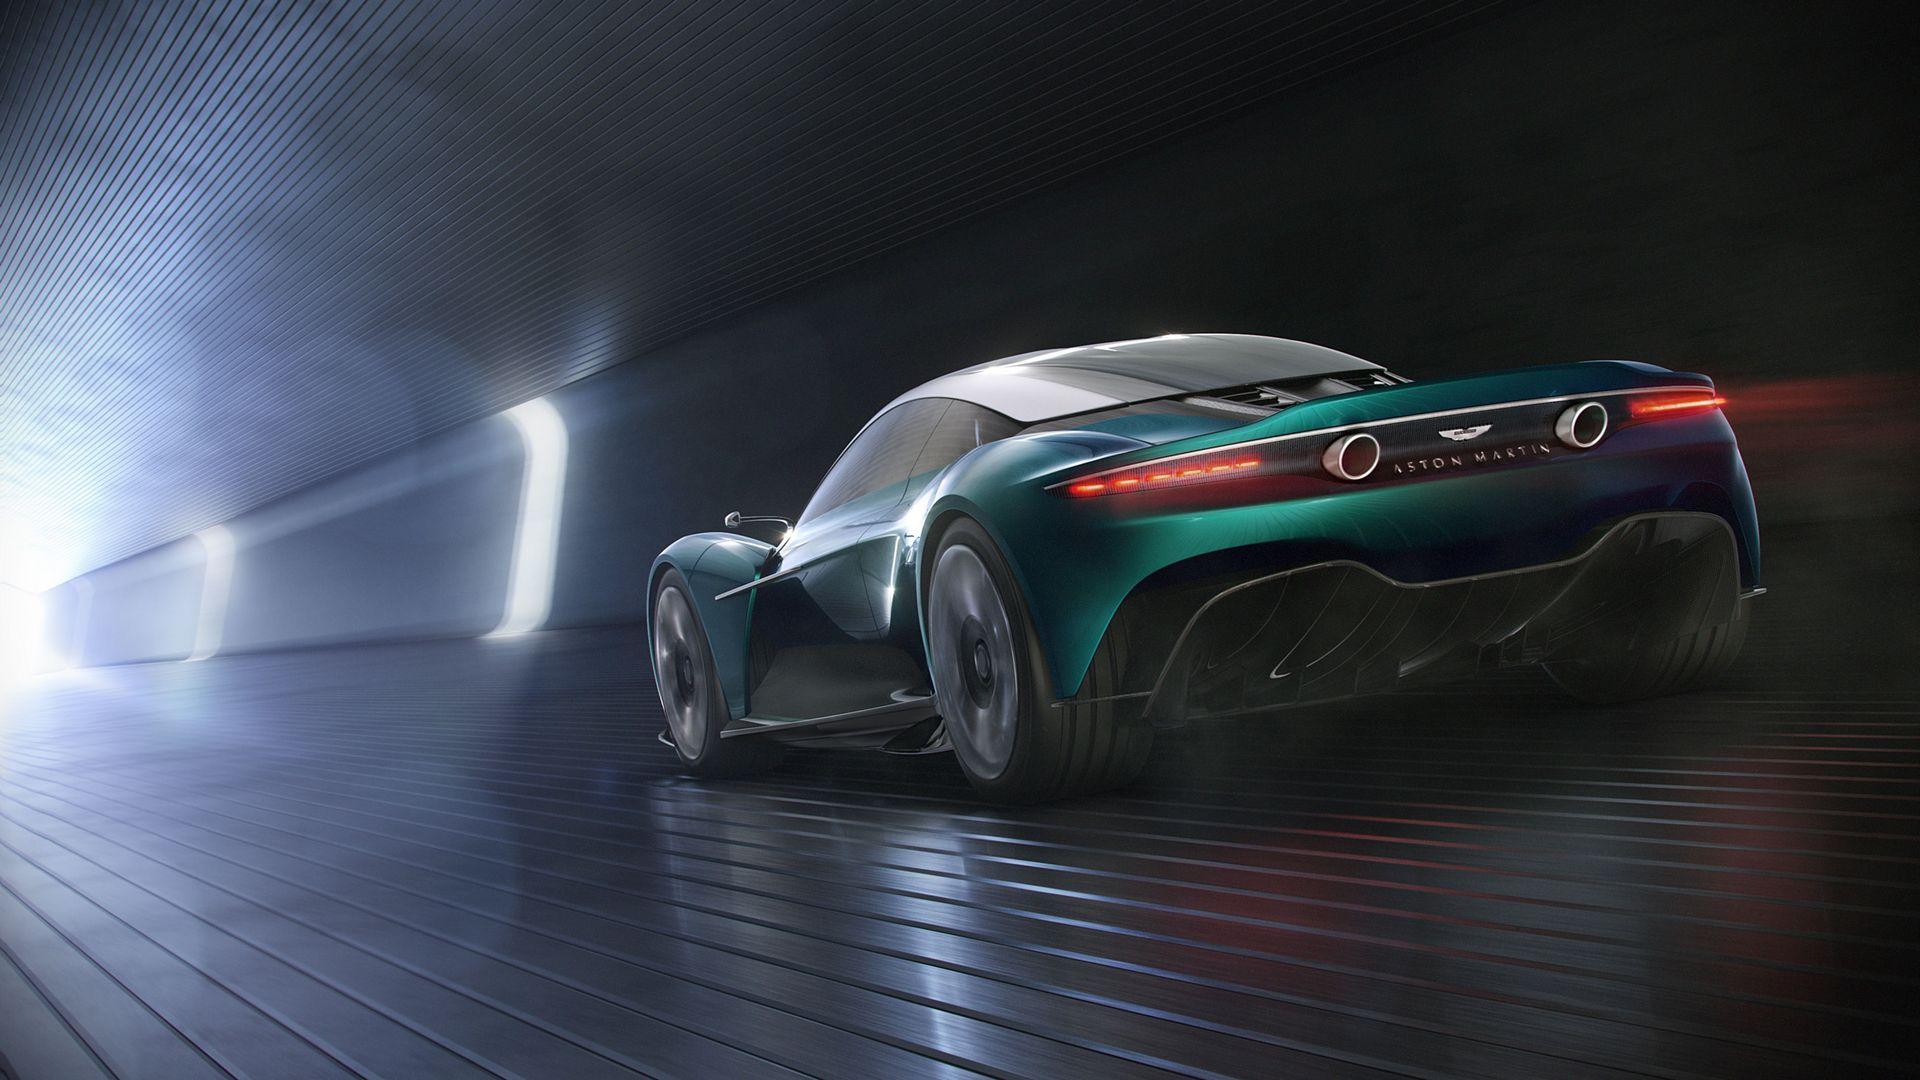 Aston Martin Vanquish Vision Concept (8)